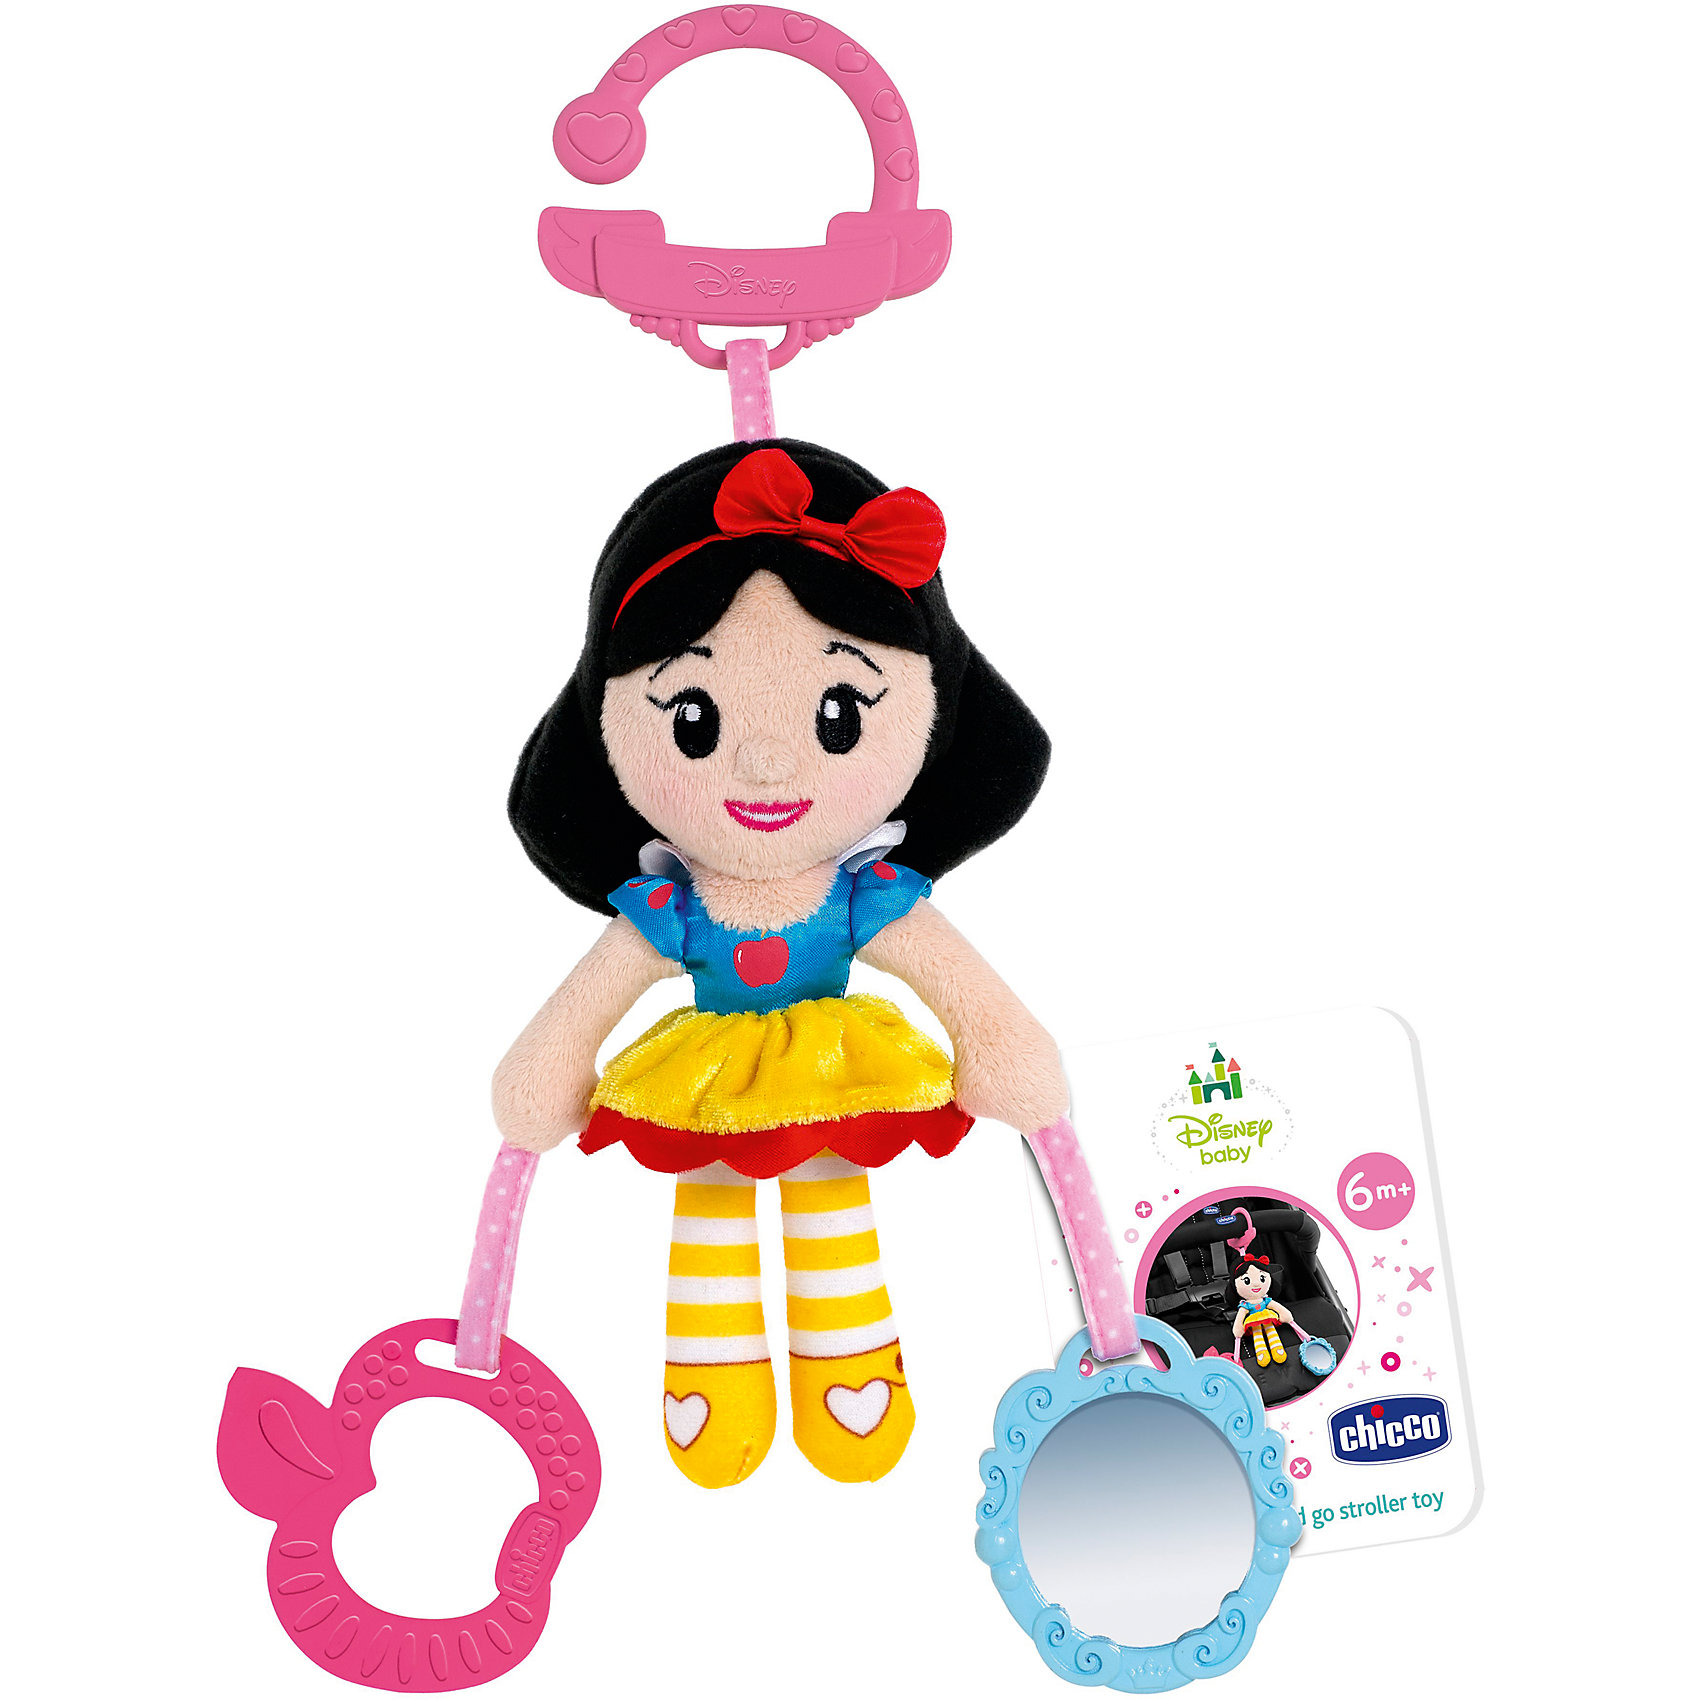 CHICCO Игрушка для коляски Белоснежка, Disney, CHICCO chicco волшебное зеркальце белоснежки